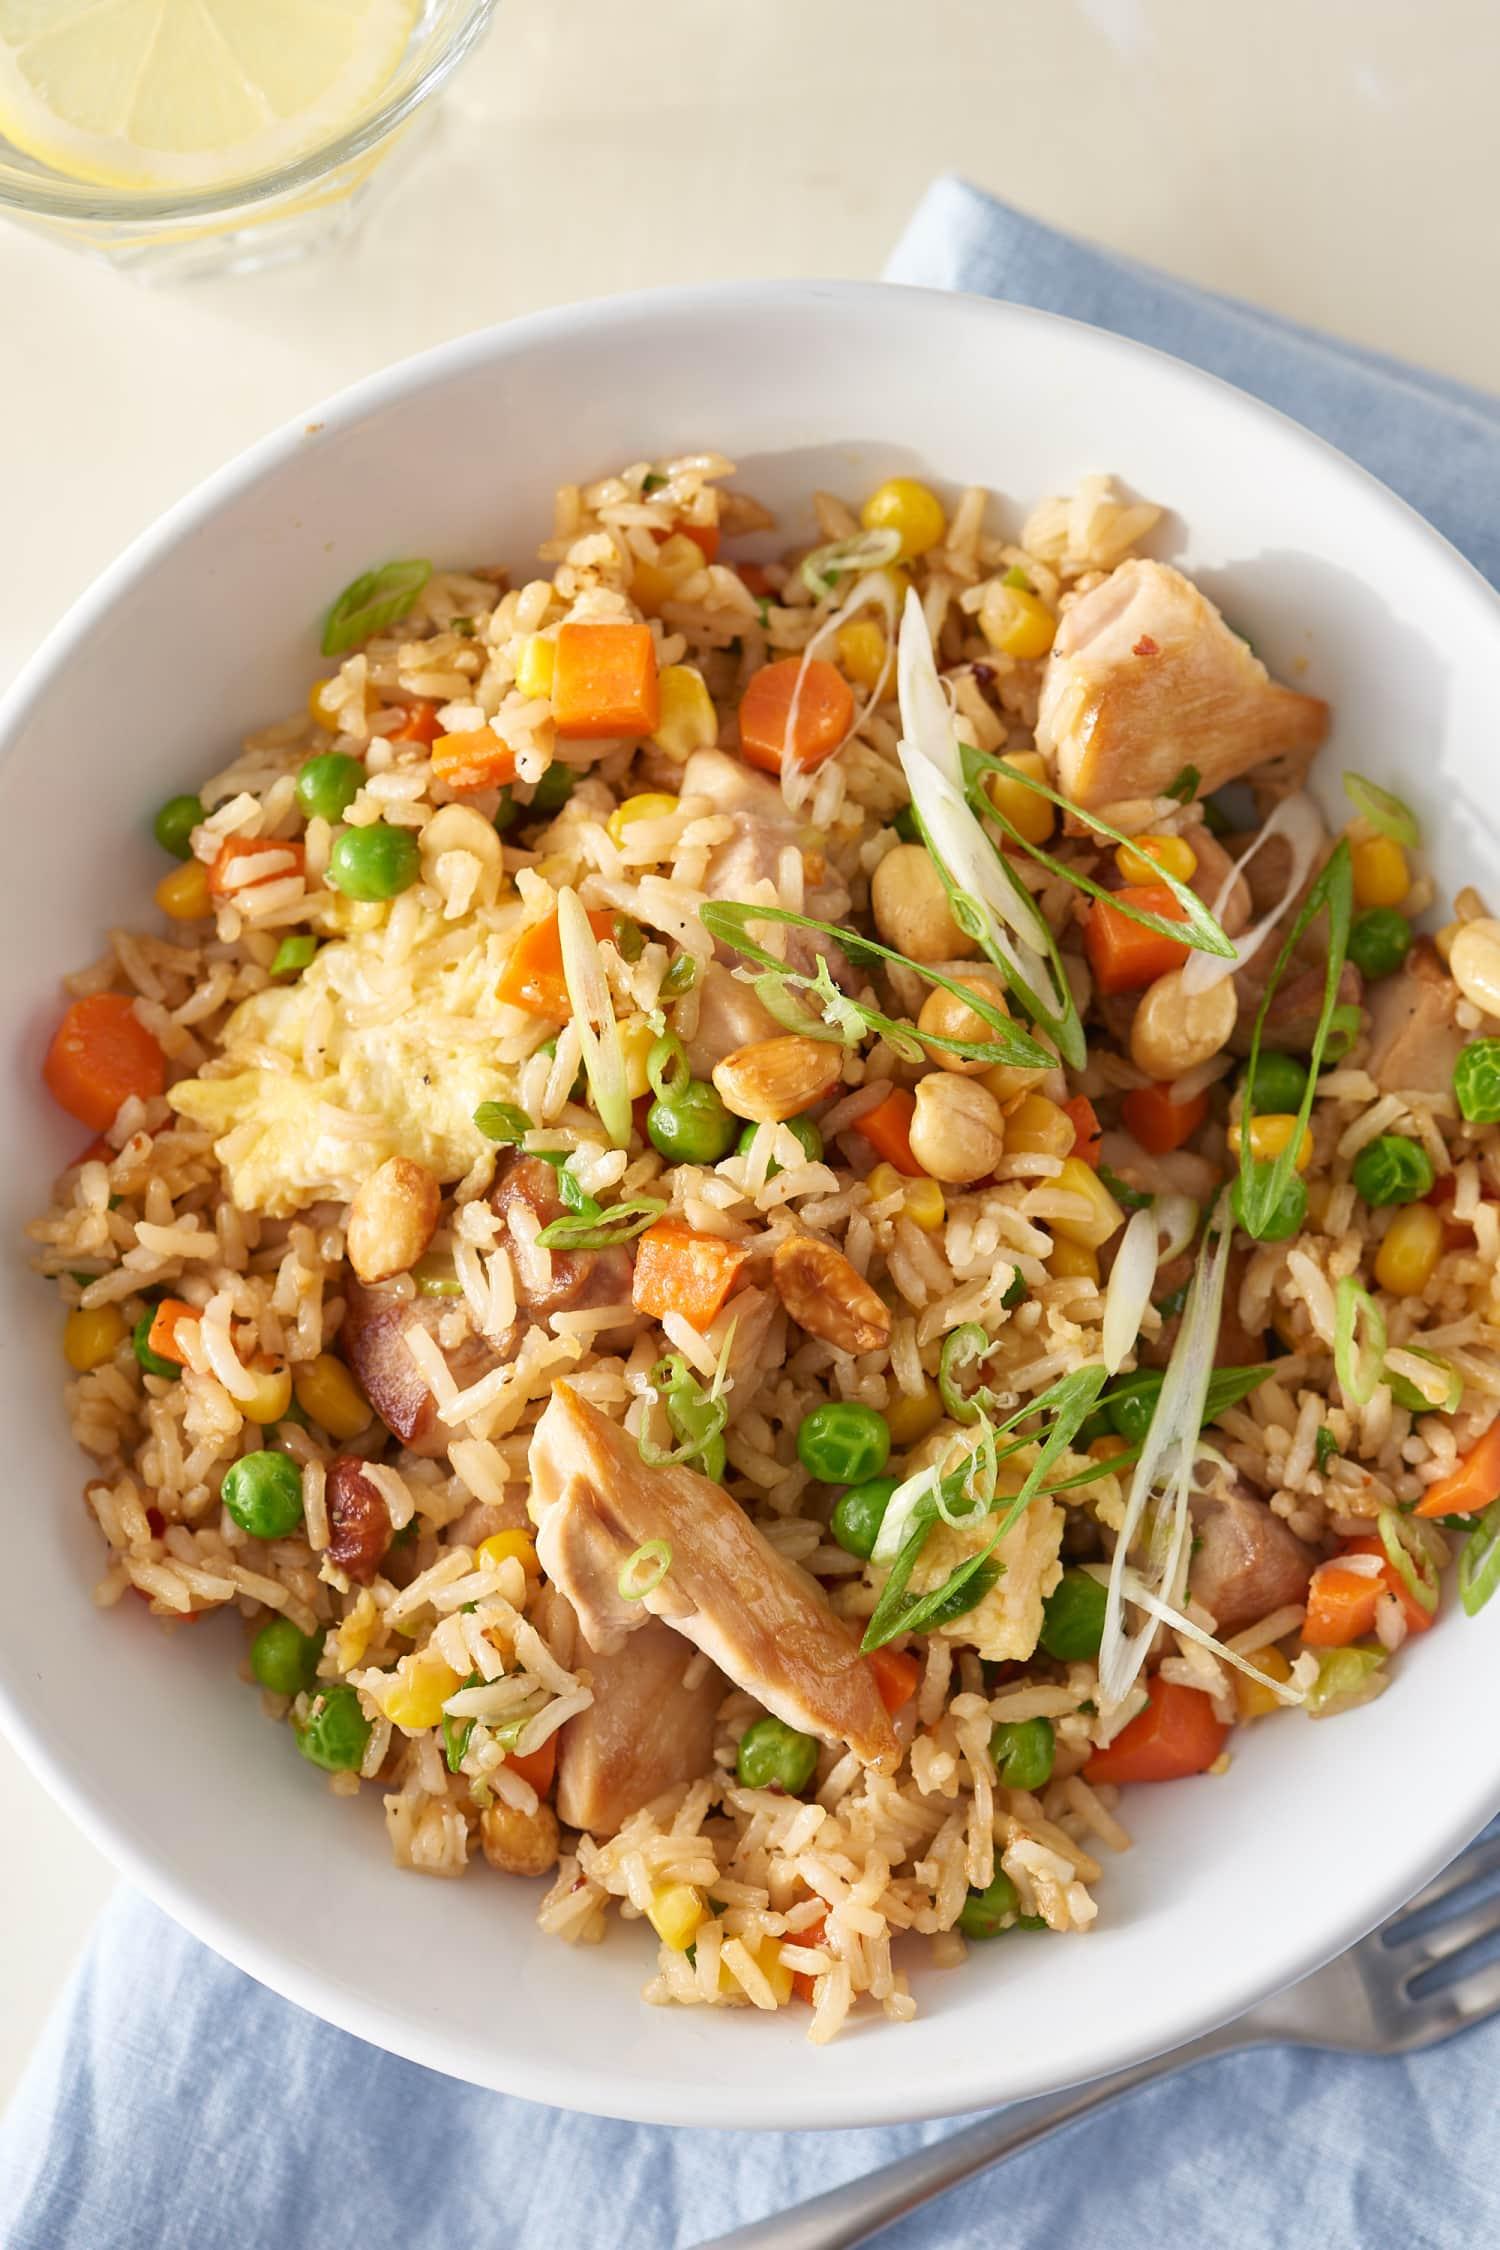 10 Rotisserie Chicken Dinner Recipes That Aren't Boring